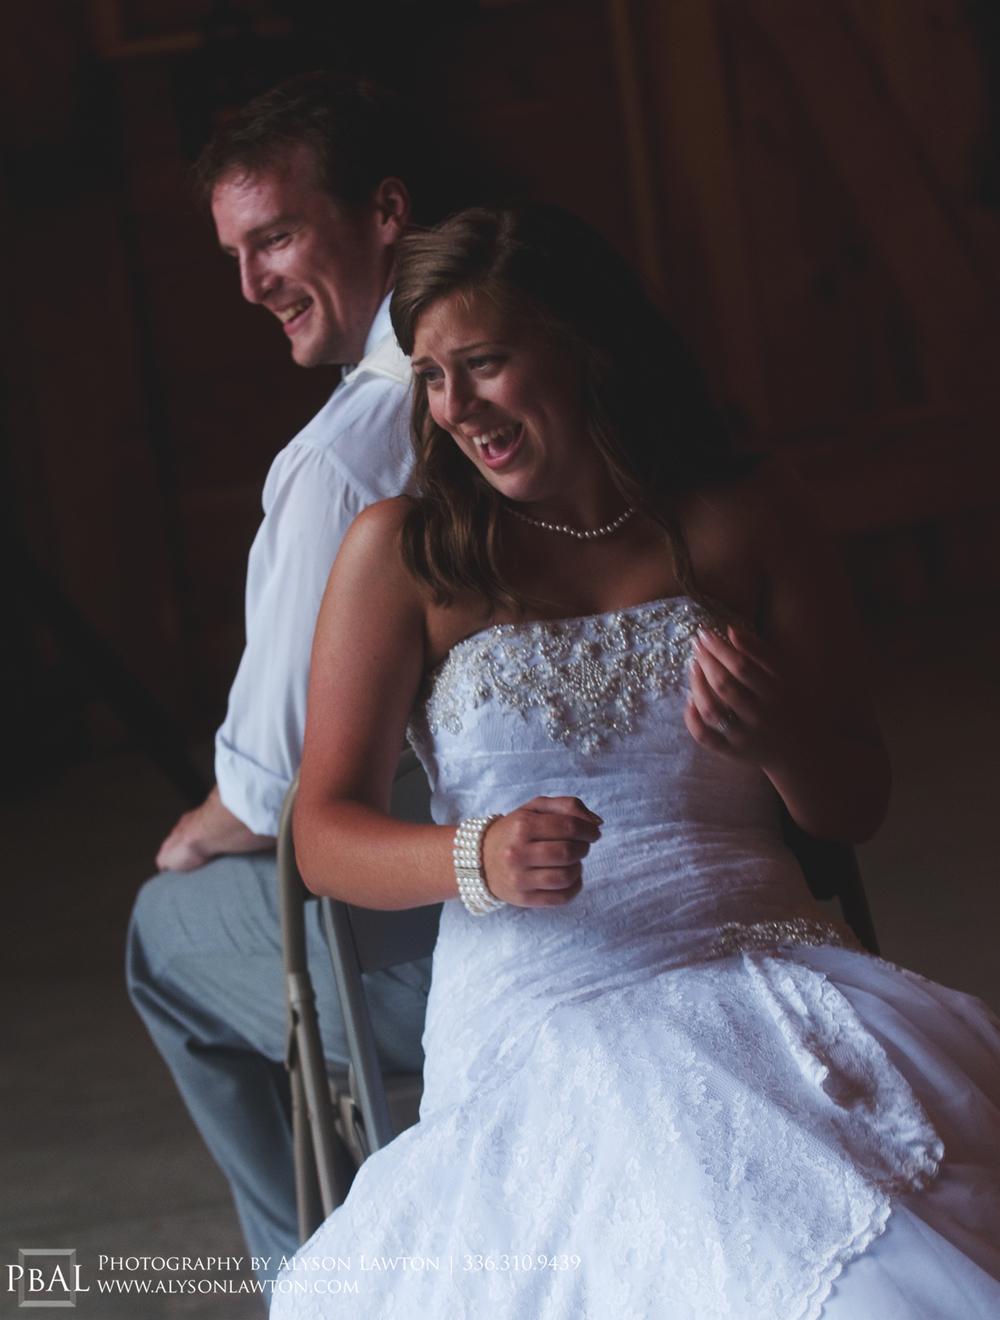 { North Carolina Wedding Photographer | Nikki & Thomas | Linwood, Tennessee | Photography by Alyson Lawton }